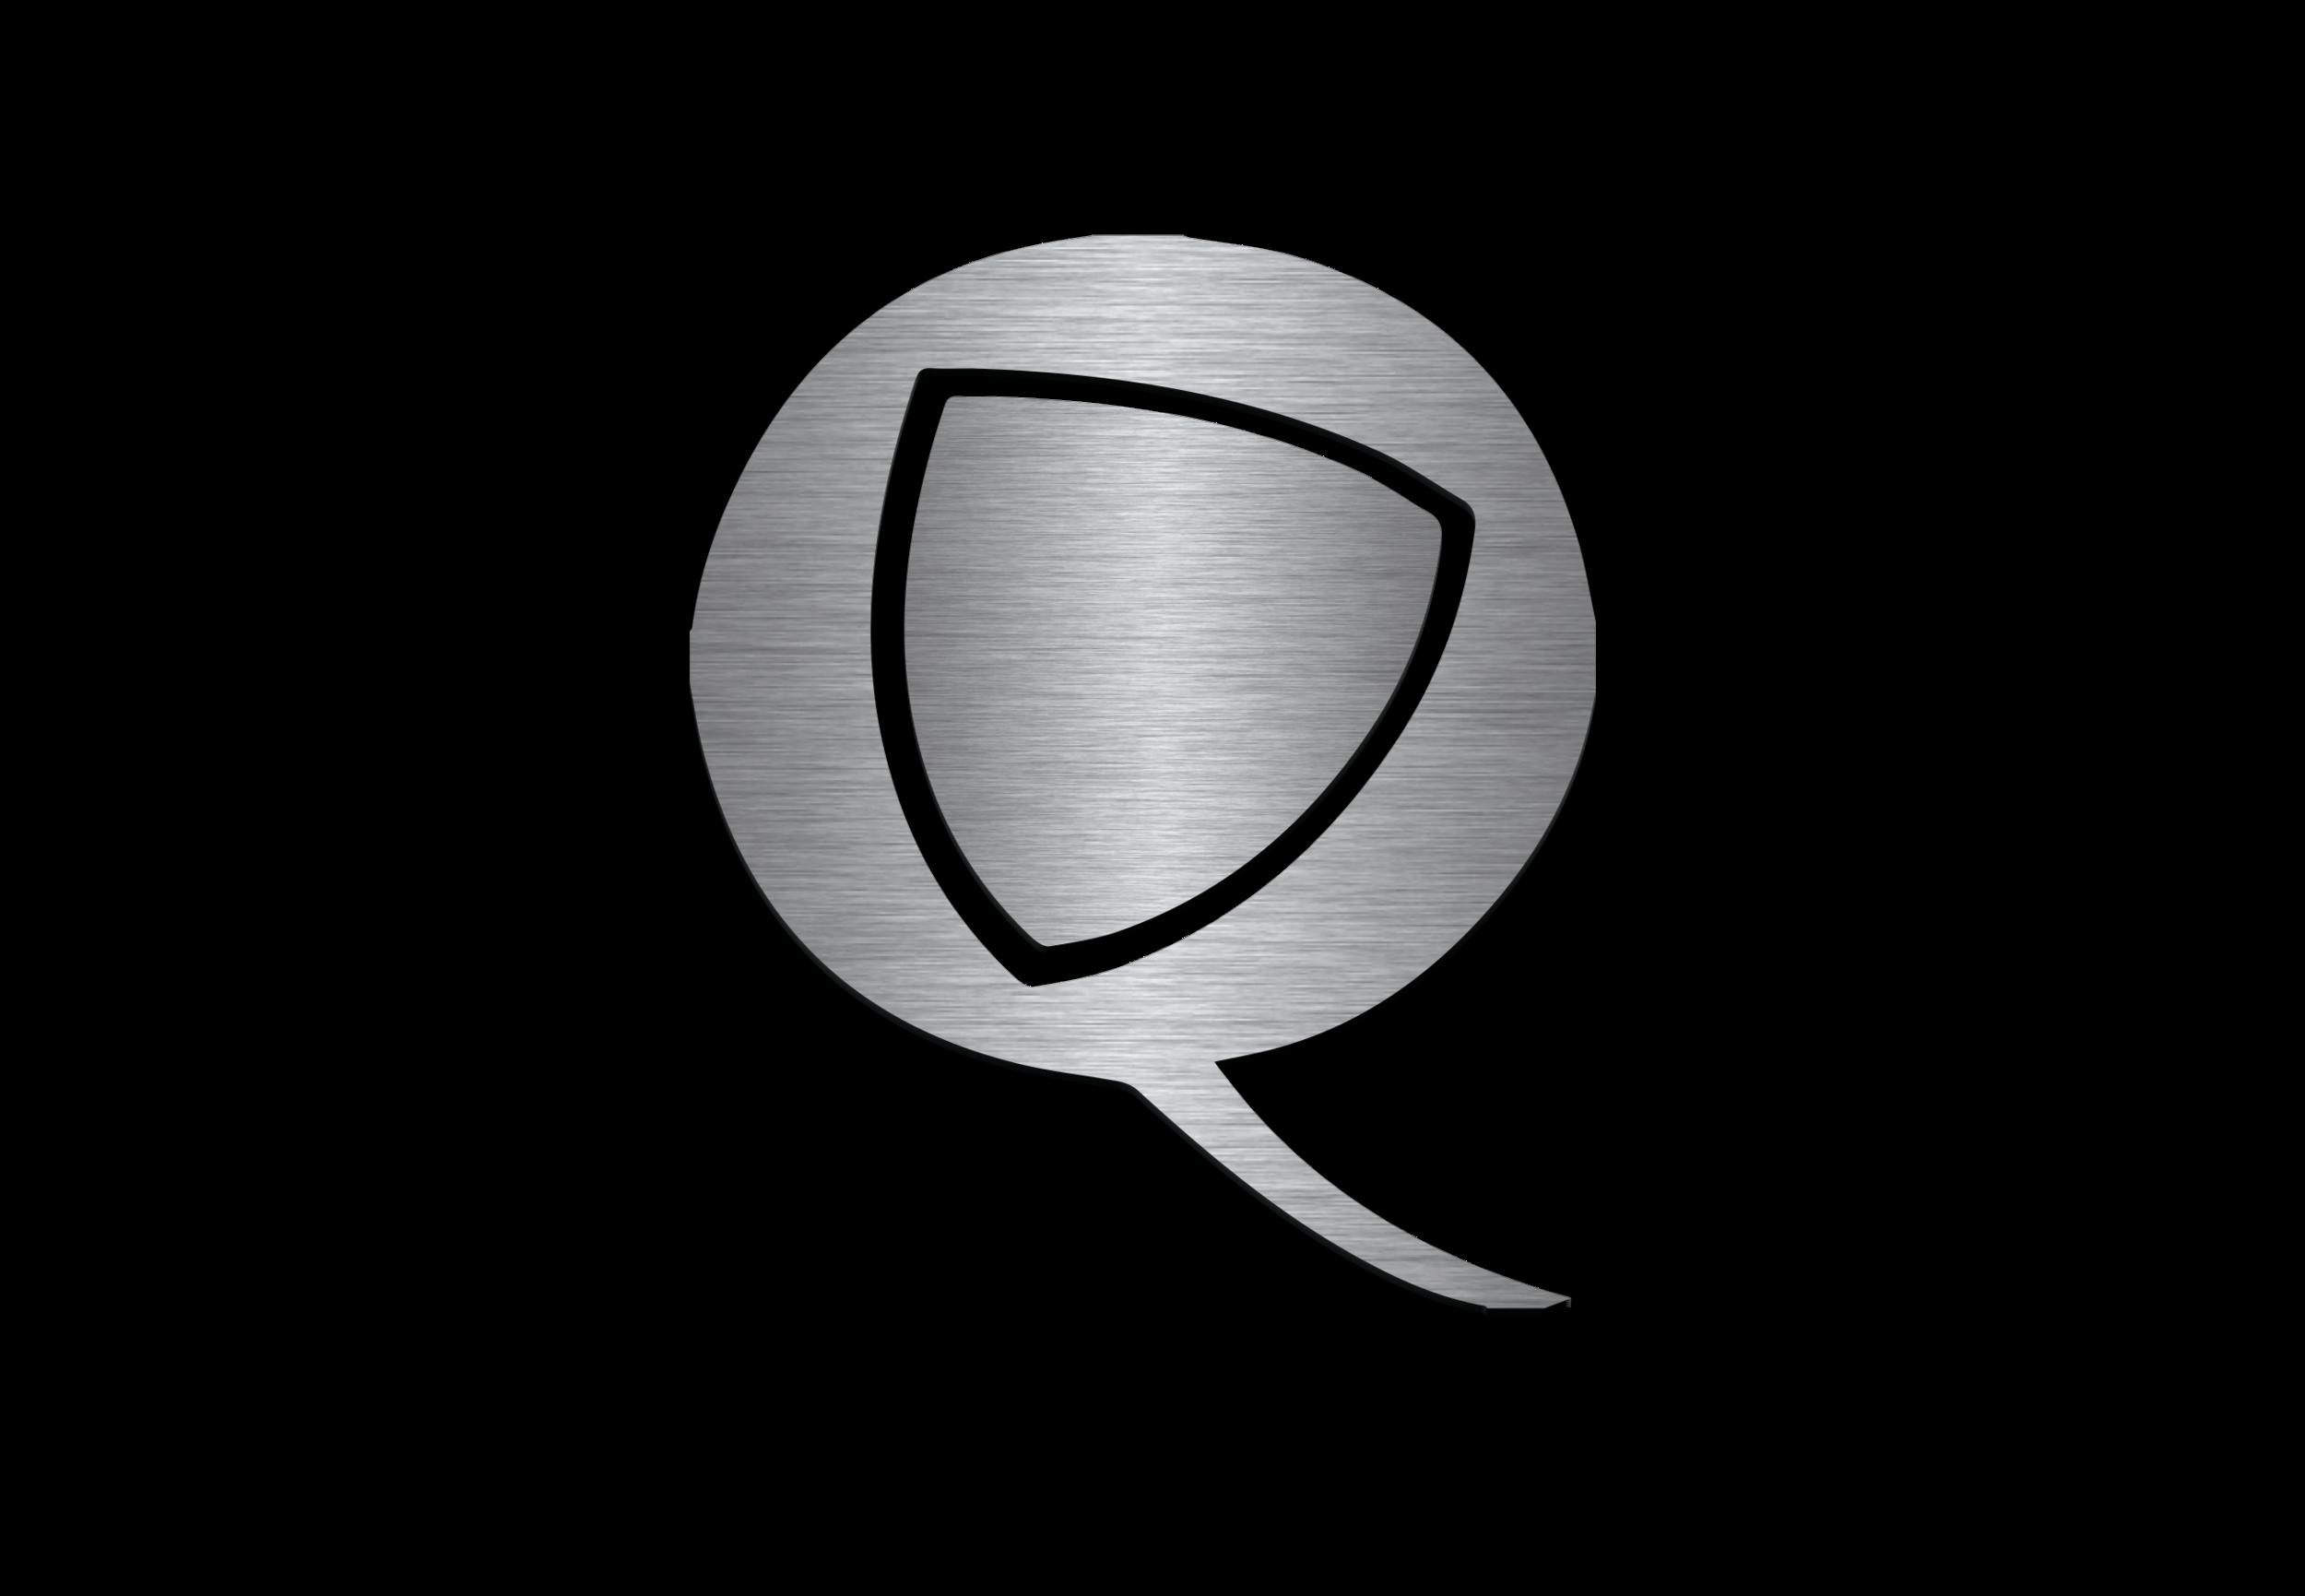 logo_transaprent_4.png